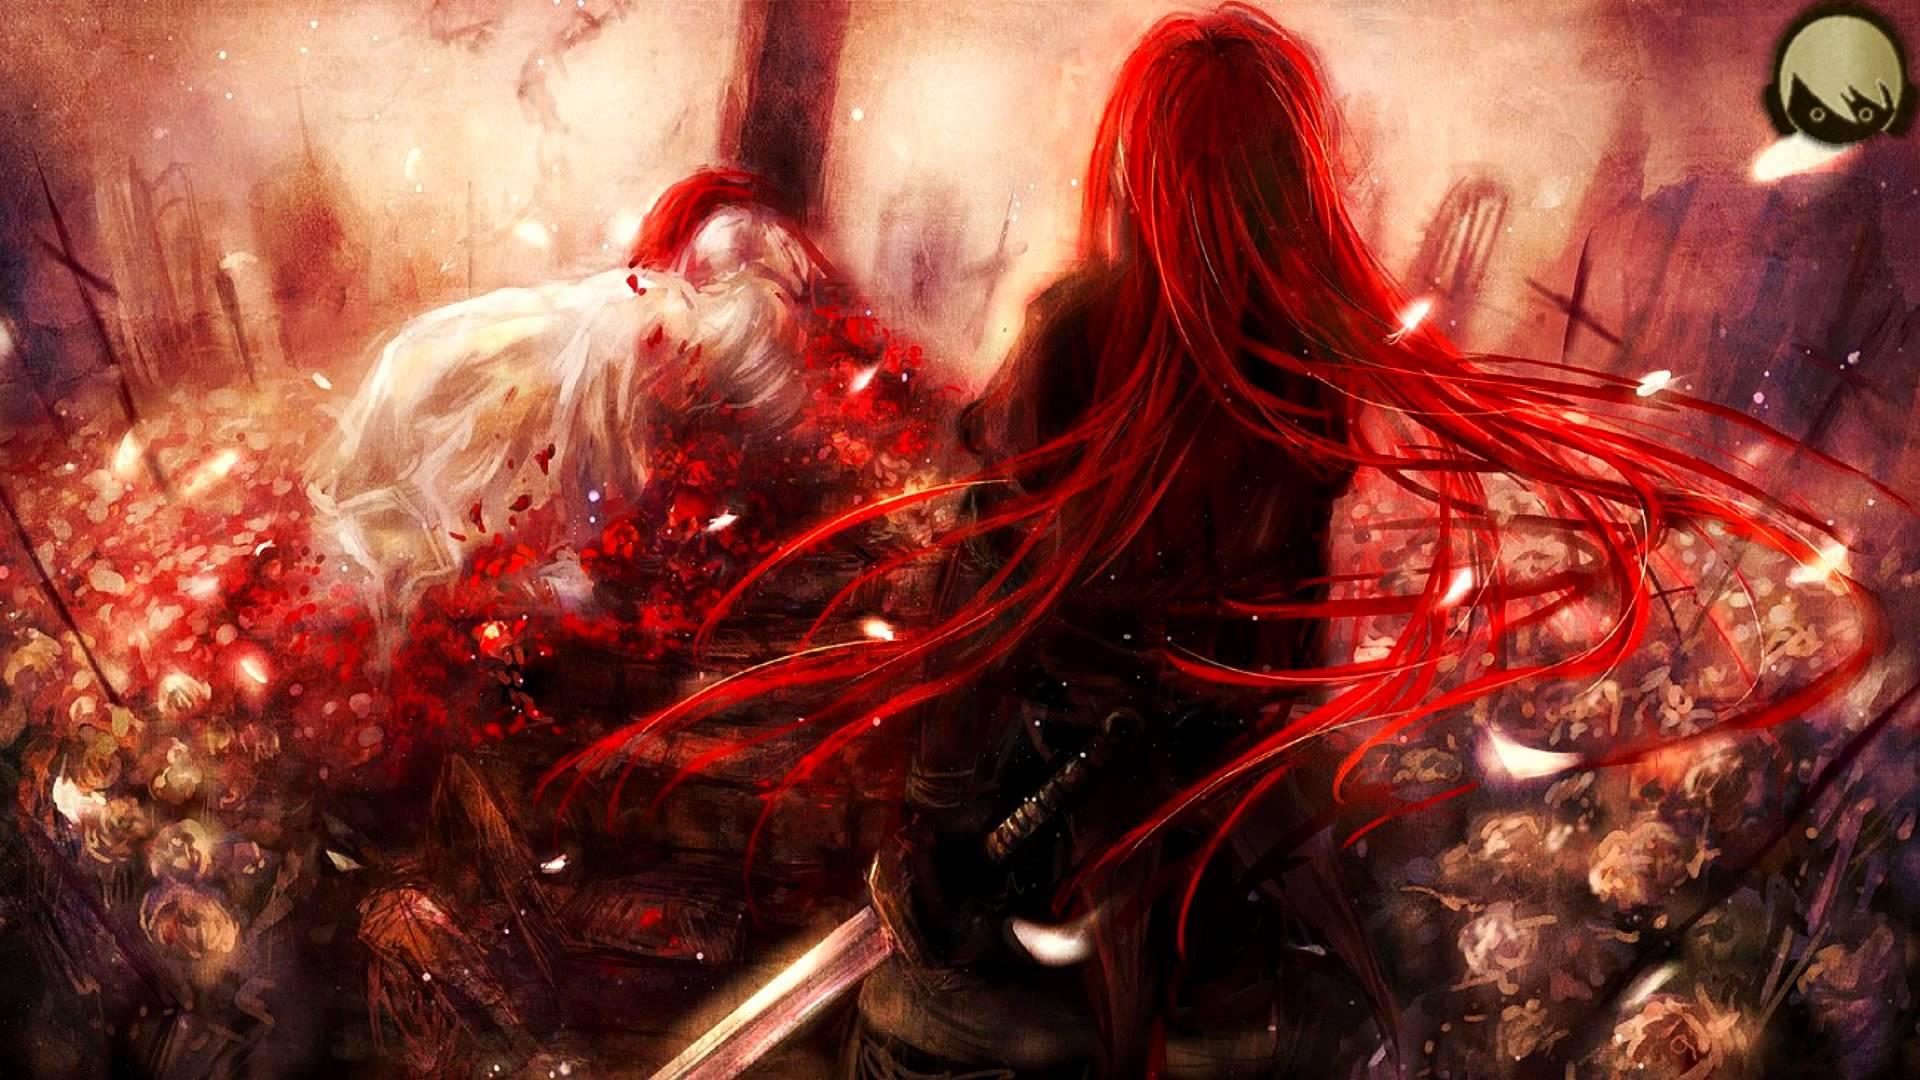 Fairy tail wallpaper erza sf wallpaper - Erza scarlet wallpaper ...